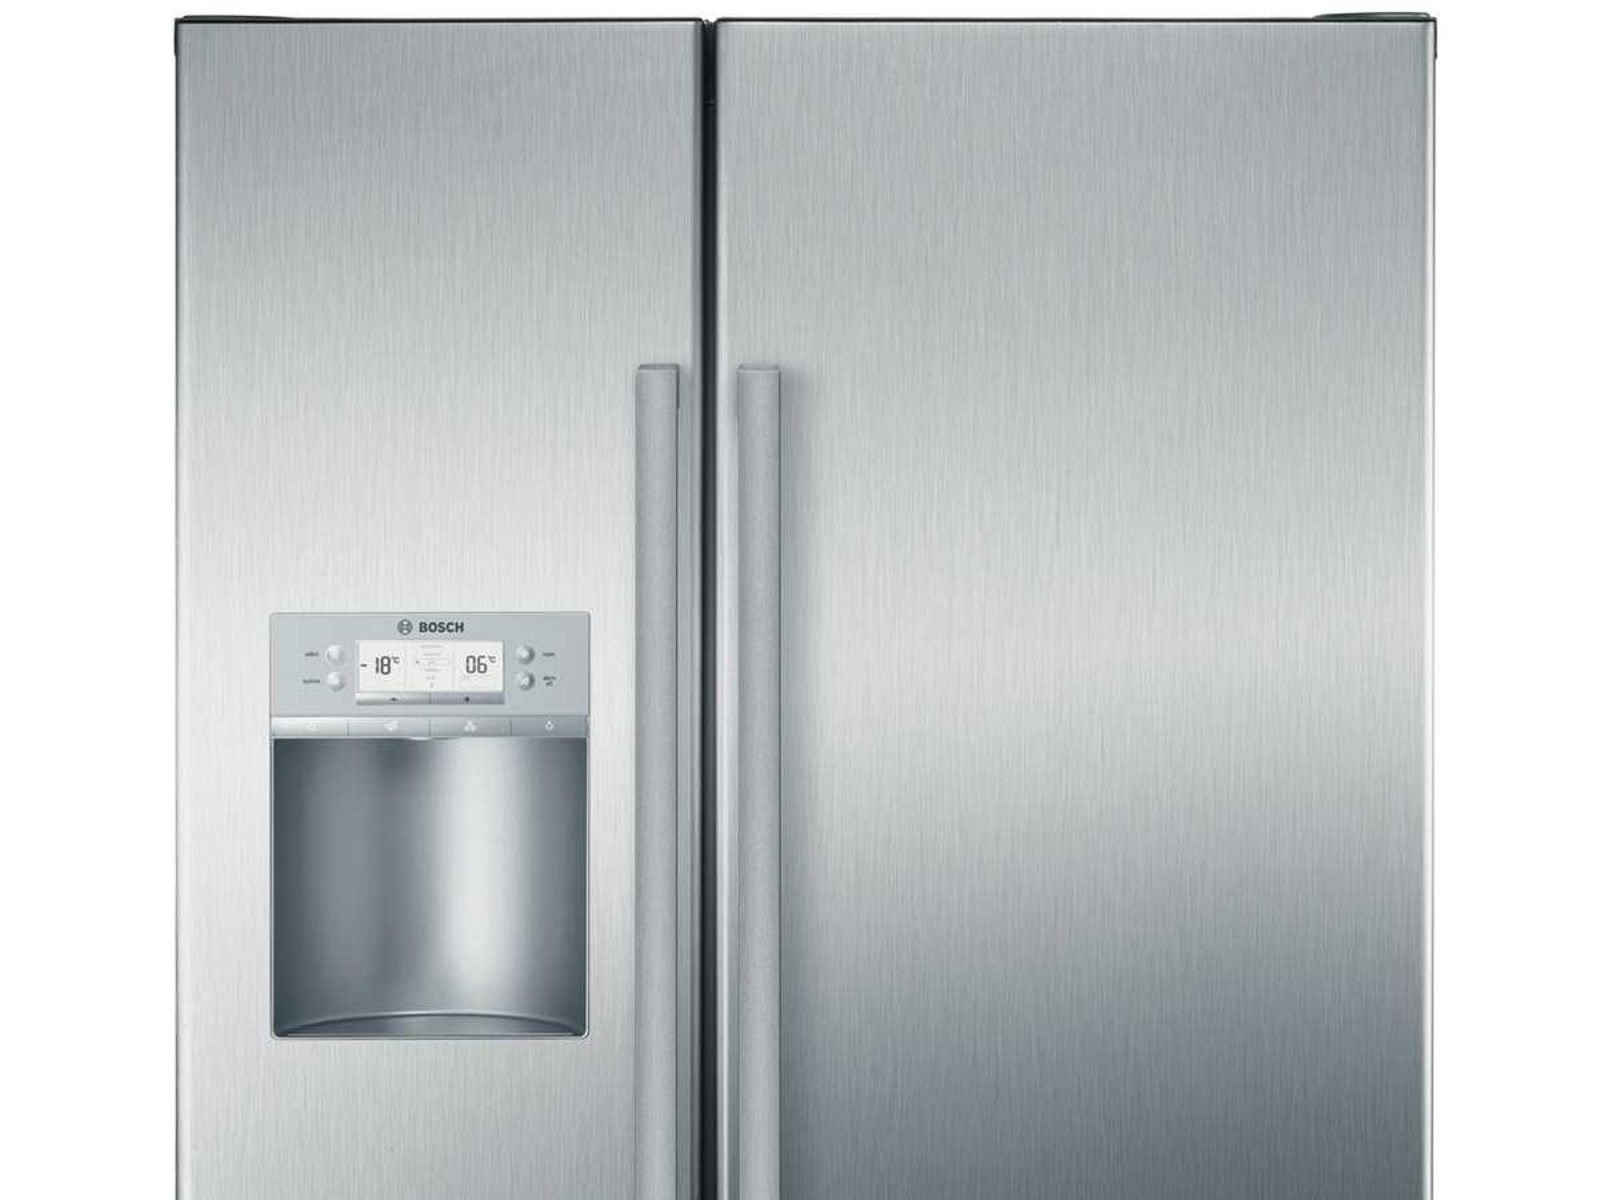 Bosch Kühlschrank Classic Edition Bedienungsanleitung : Bosch side by side kühlschrank bedienungsanleitung rachael haugh blog